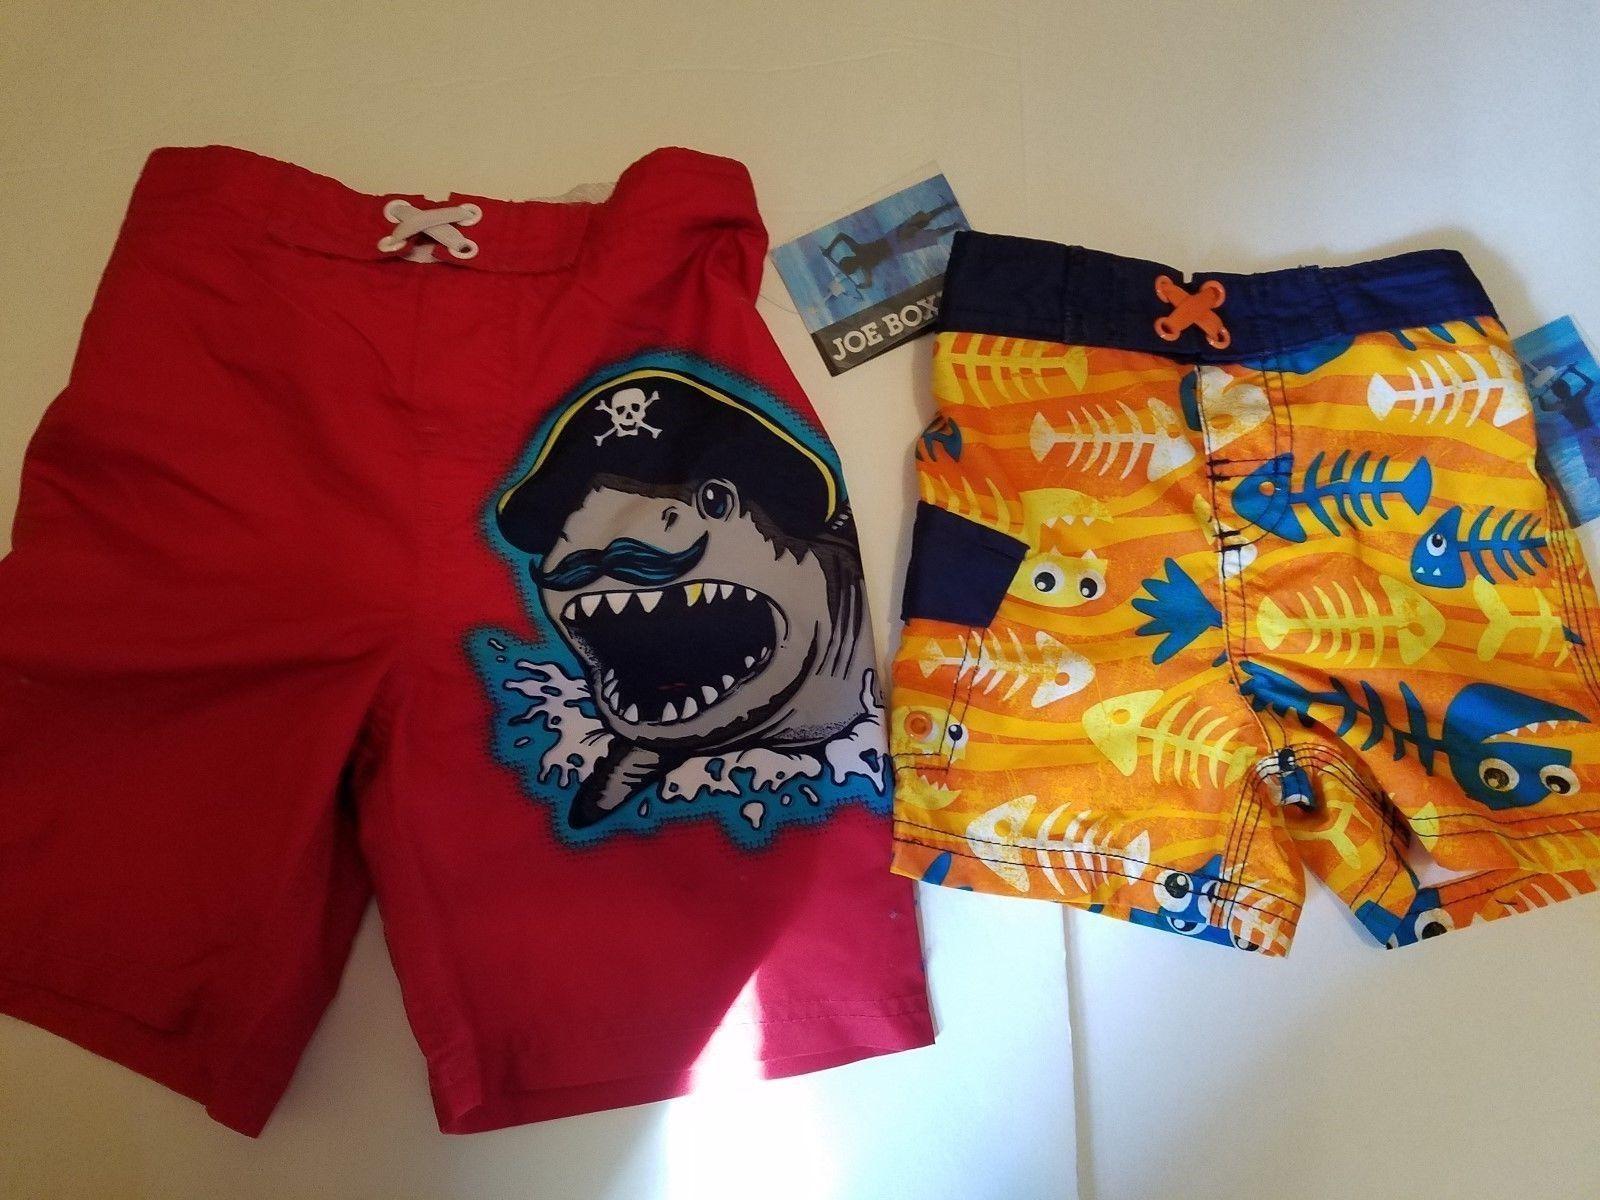 b2eabfc8be438 Joe Boxer Infant Toddler Boys Board Short and 50 similar items. S l1600